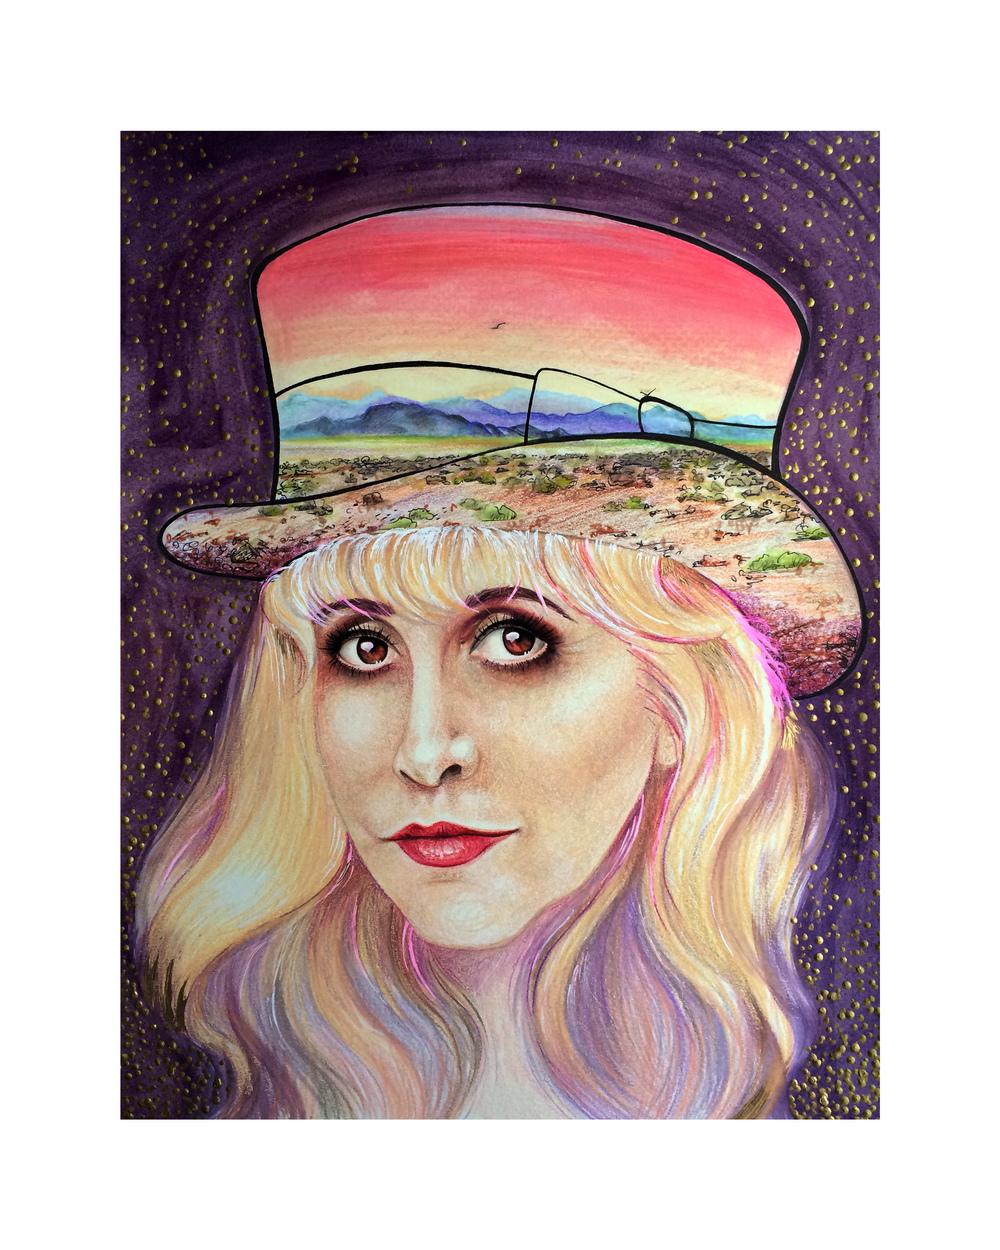 Colored_Pencil_Stevie_Nicks_Portrait.jpg